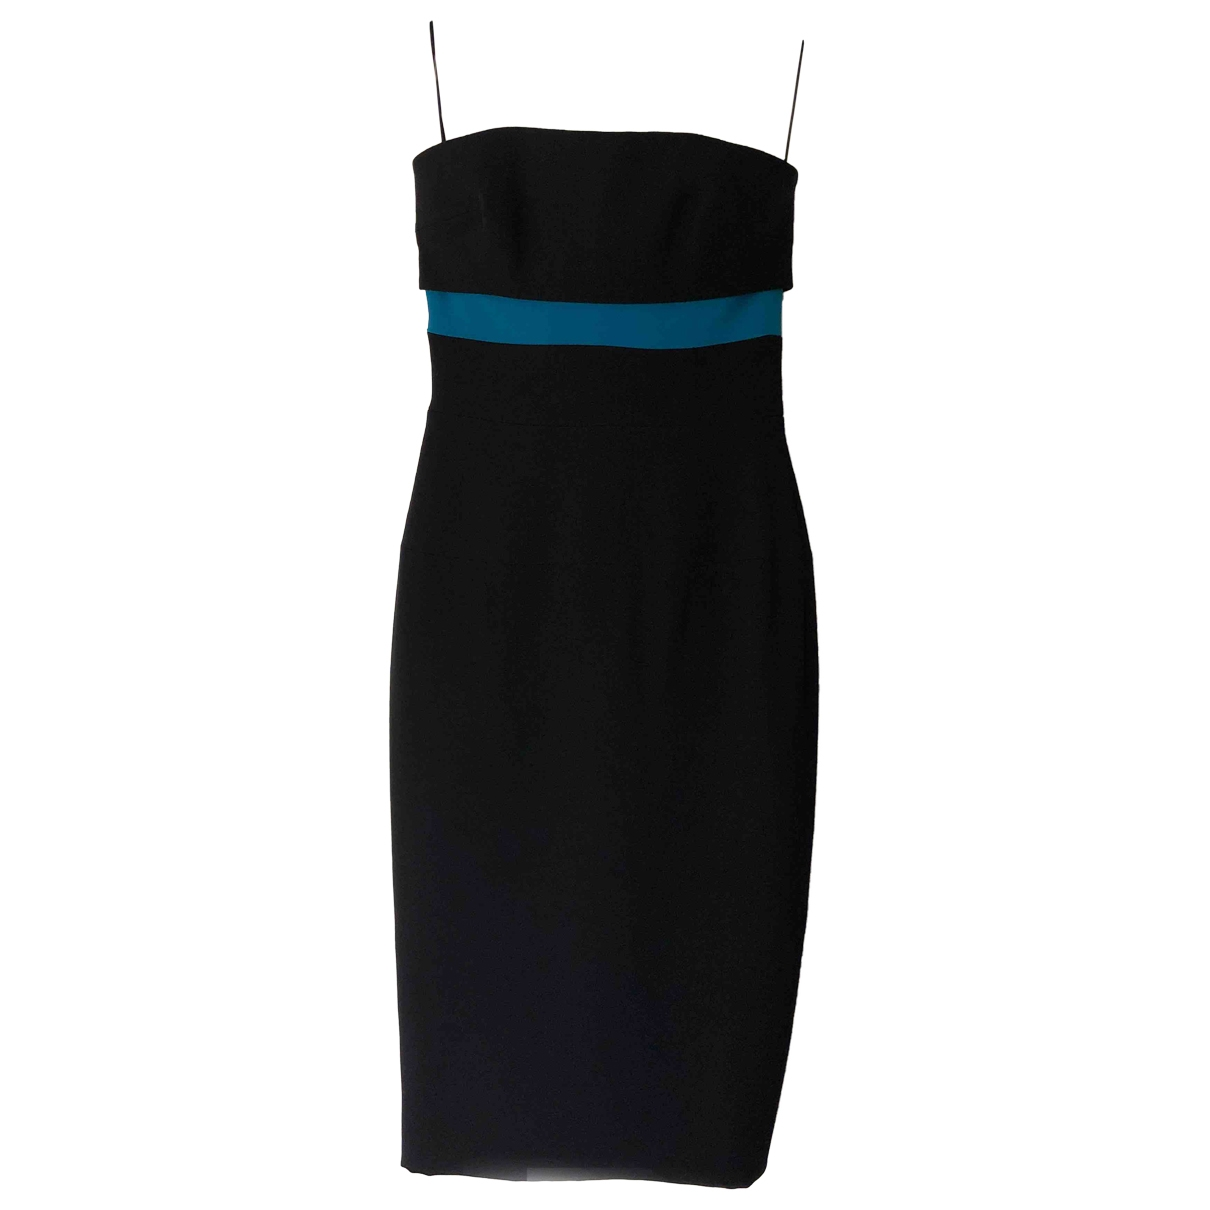 Victoria Beckham \N Black Cotton - elasthane dress for Women 10 UK